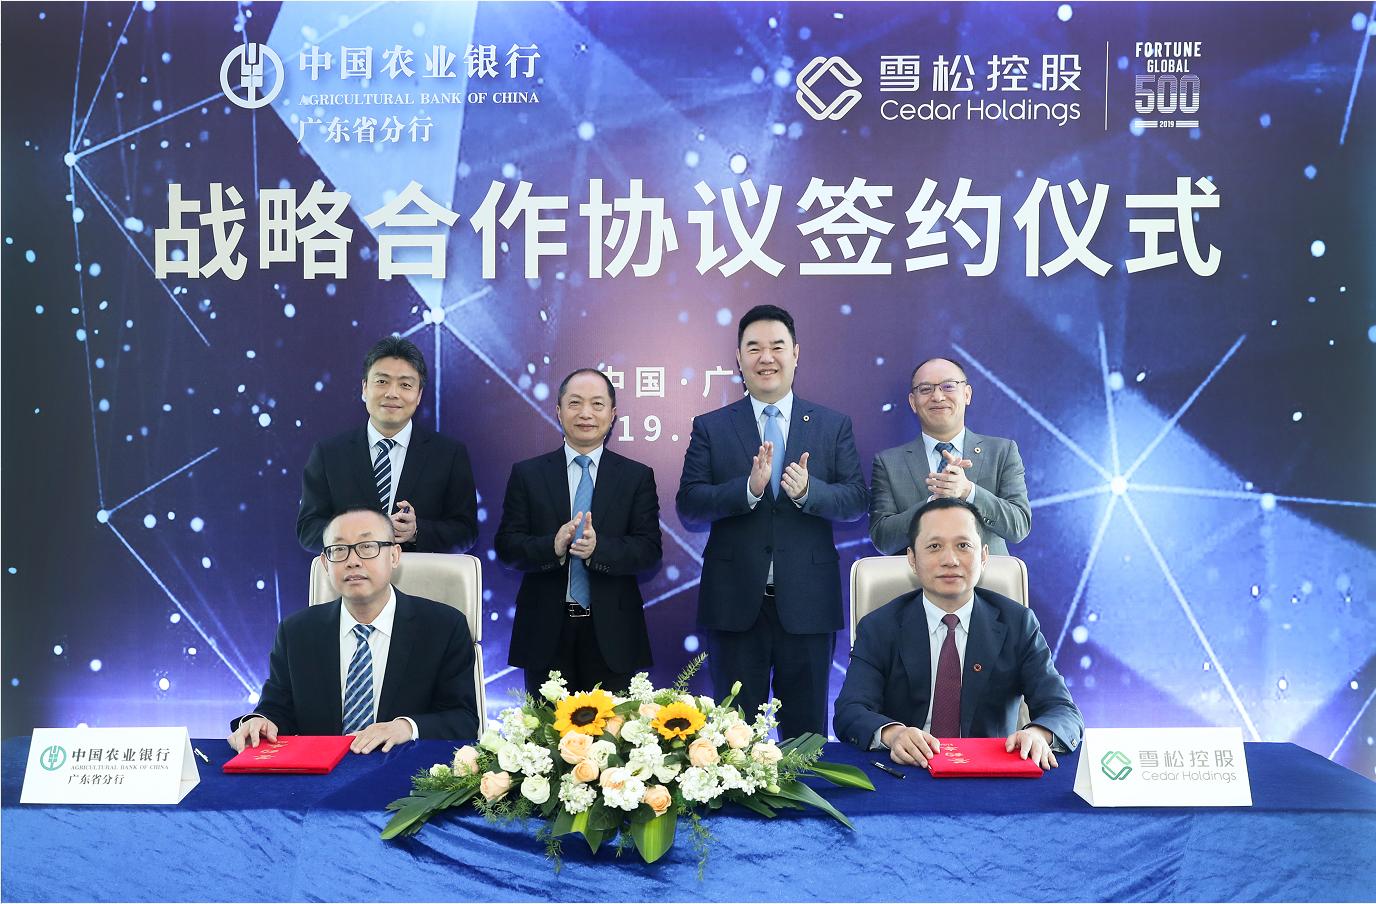 https://newresource.mbcaijing.com/serverImages/article/20191206/list/BfB_120618034549199.jpg